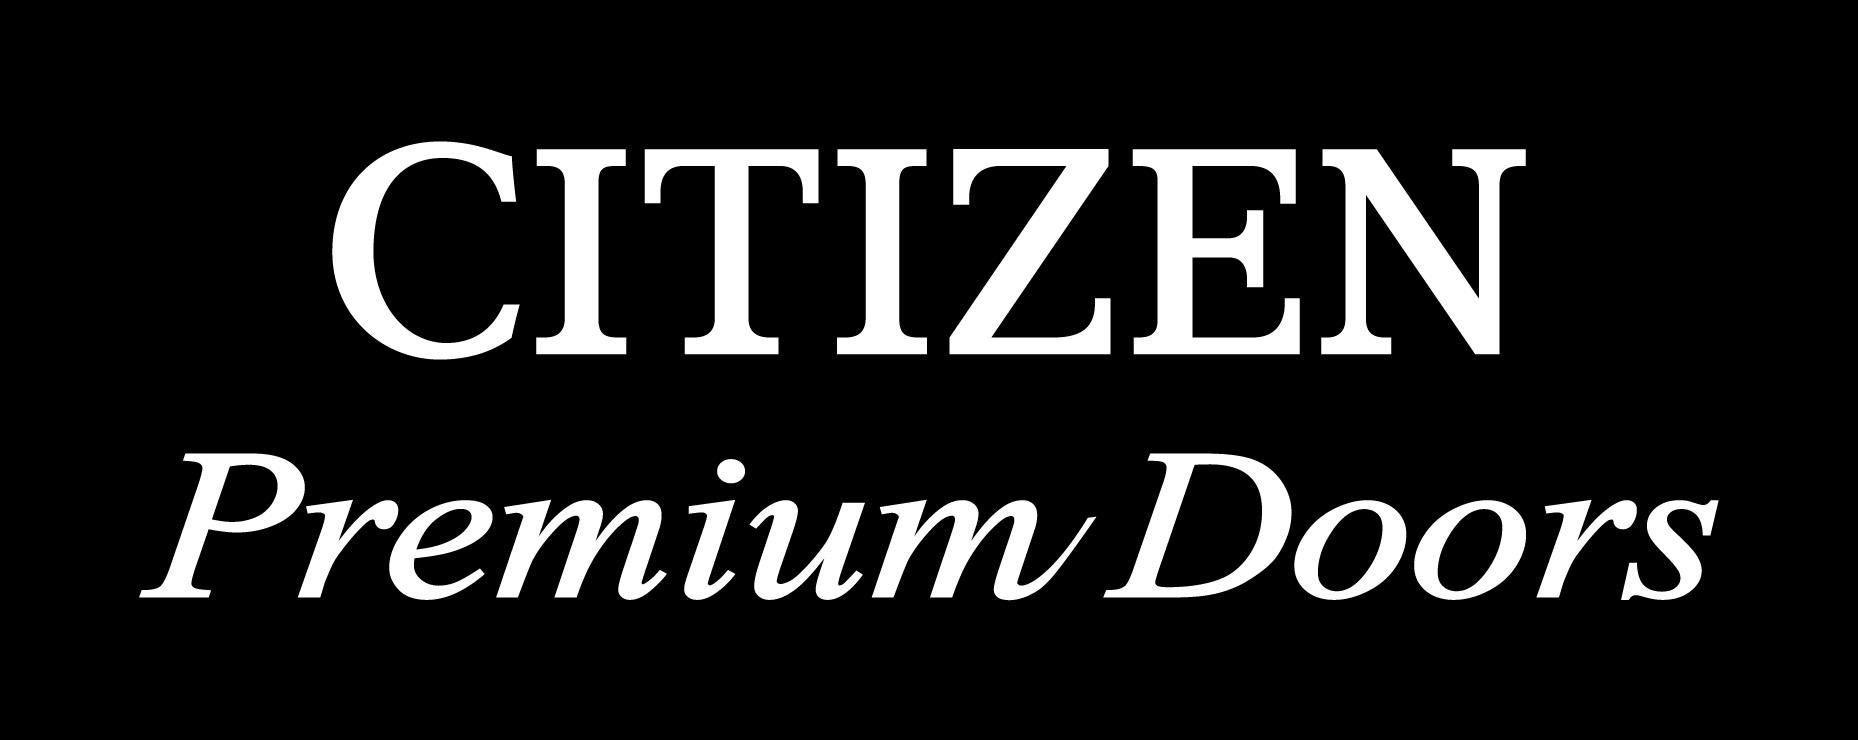 【CITIZEN Premium Doors】